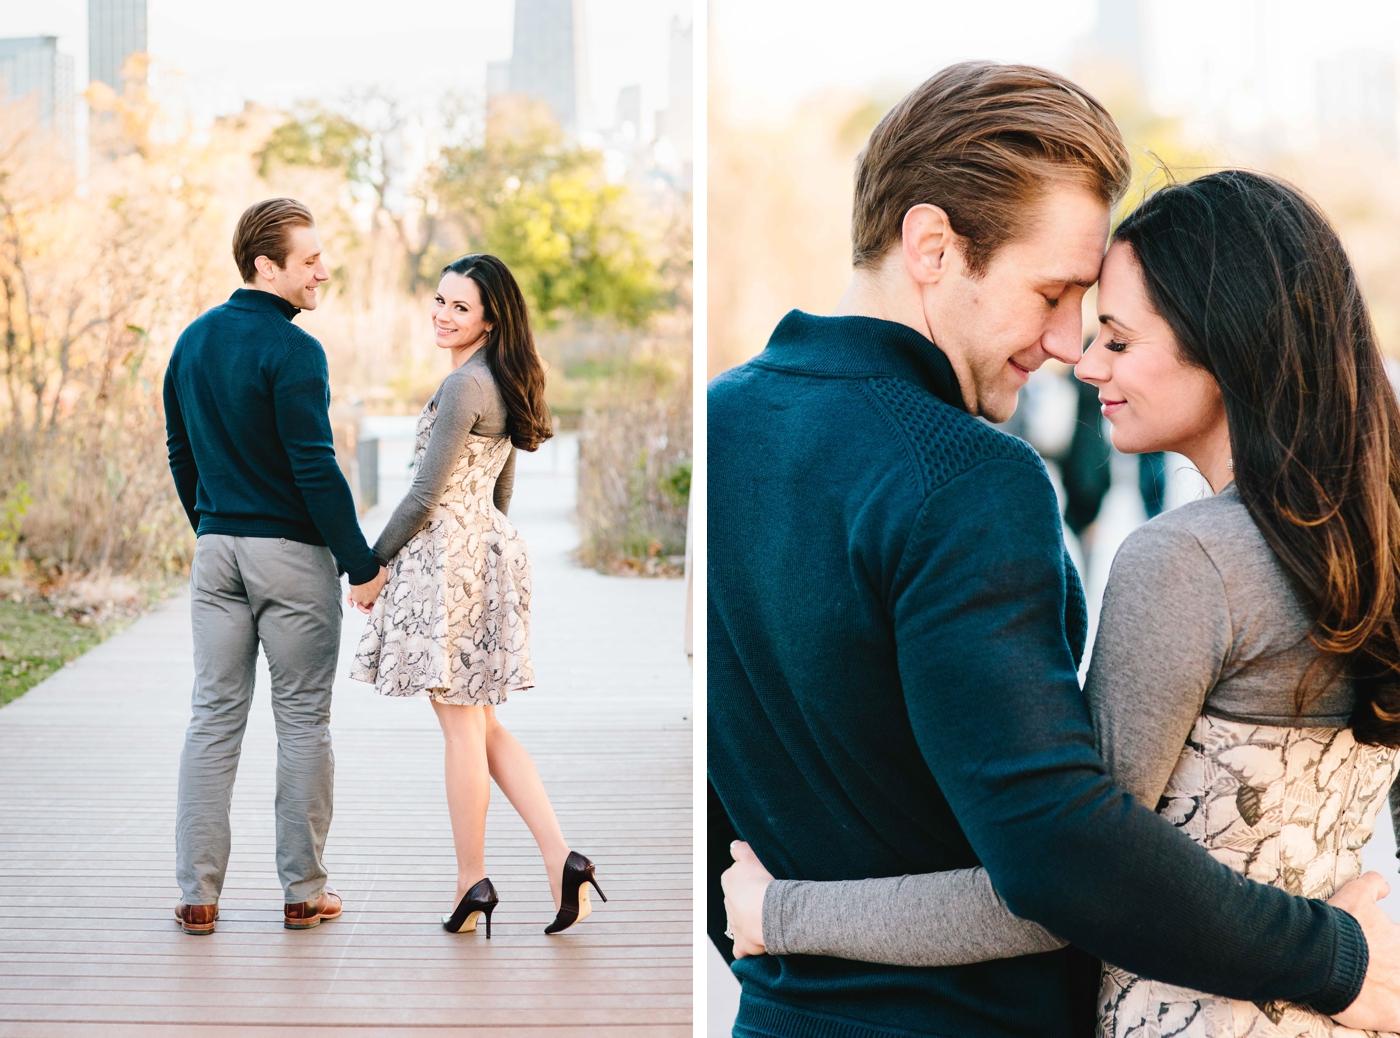 chicago-fine-art-wedding-photography-chriserin11